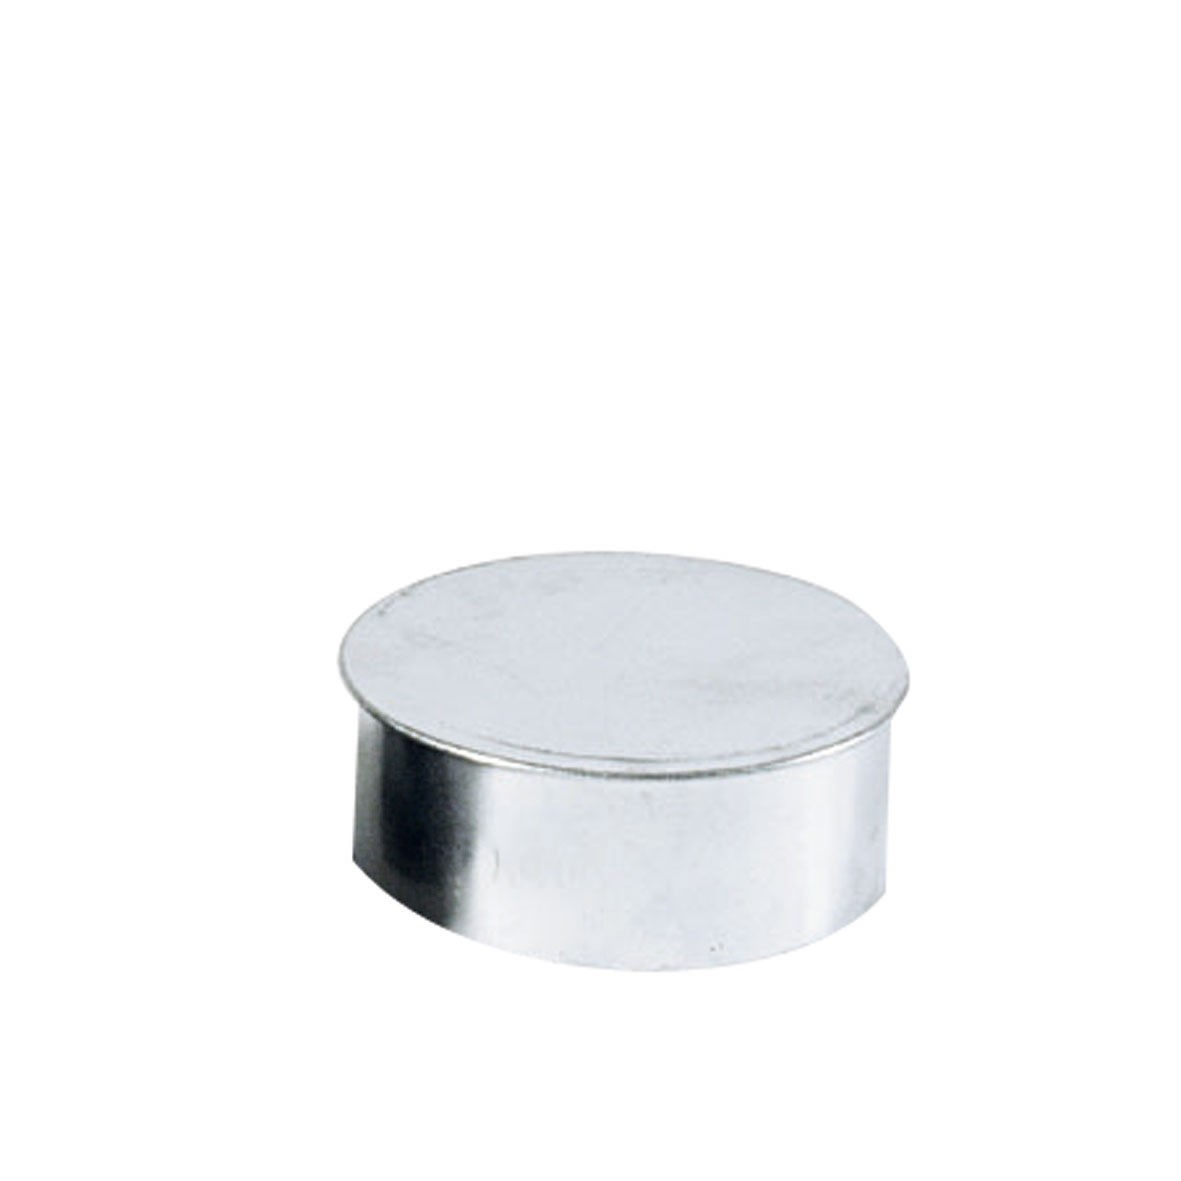 Kaminlochkapsel / Rohrkapsel KaminoFlam FAL Ø 130 mm Bild 1